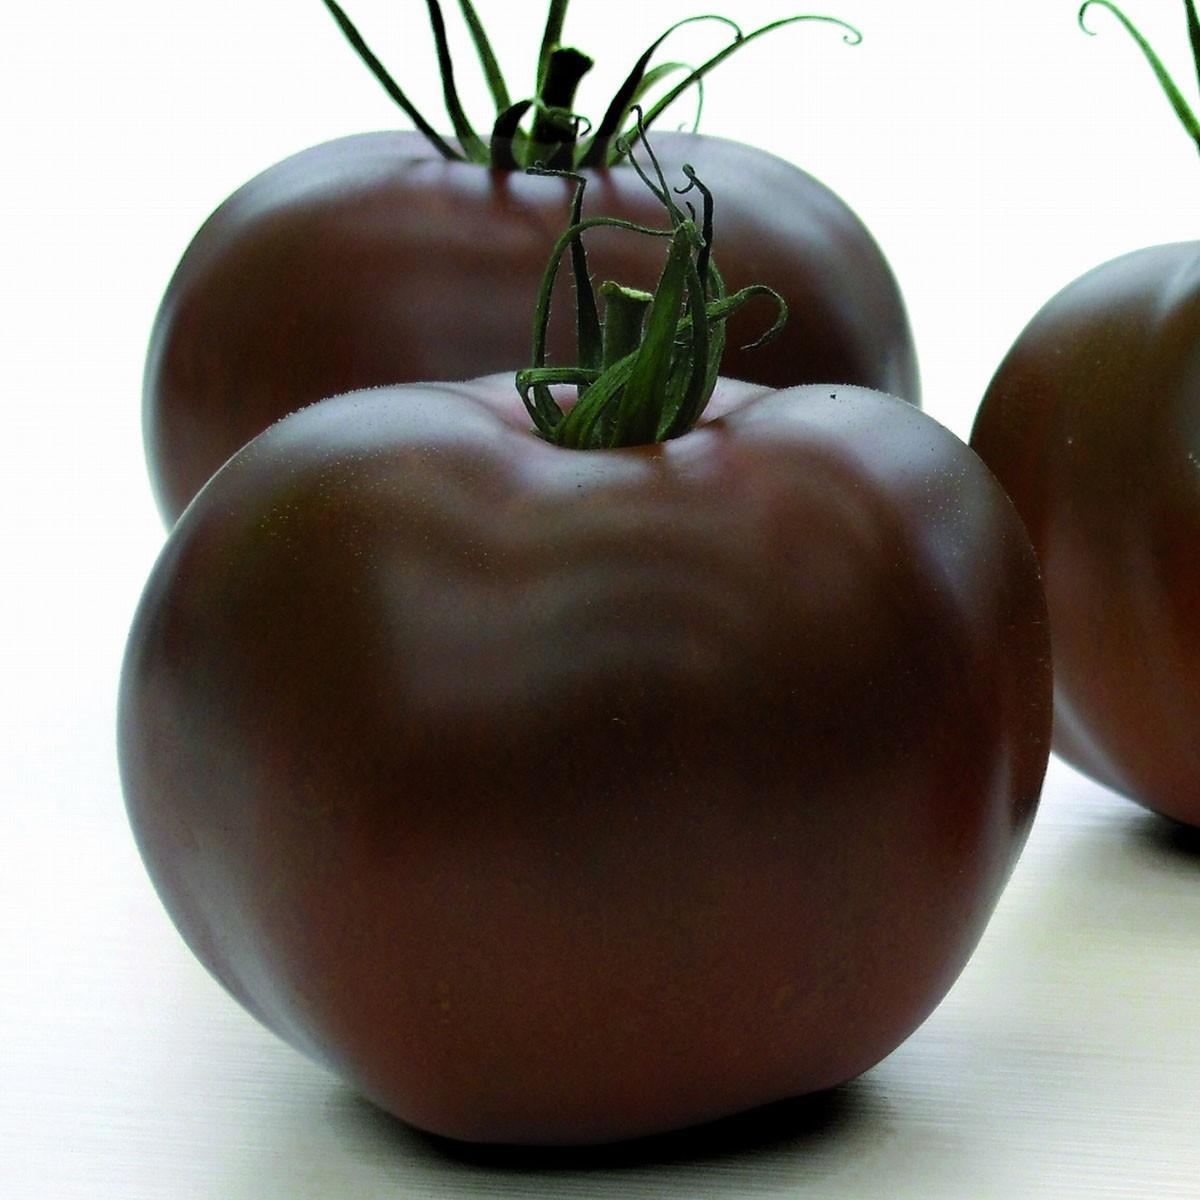 Schokoladen-Tomate 'Kakao' (veredelt) - 140gr.